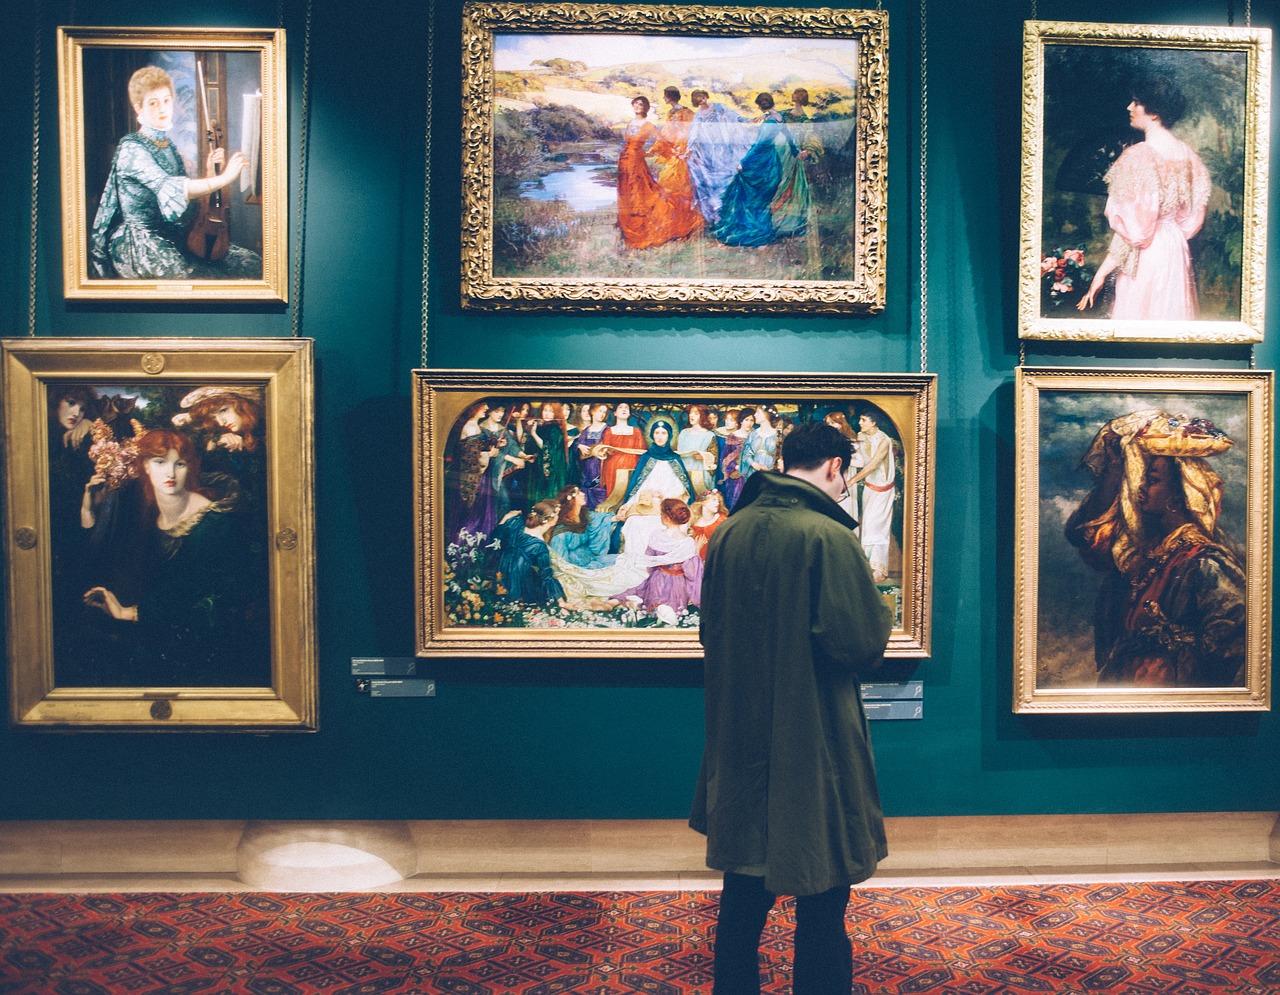 types expositions photos paris